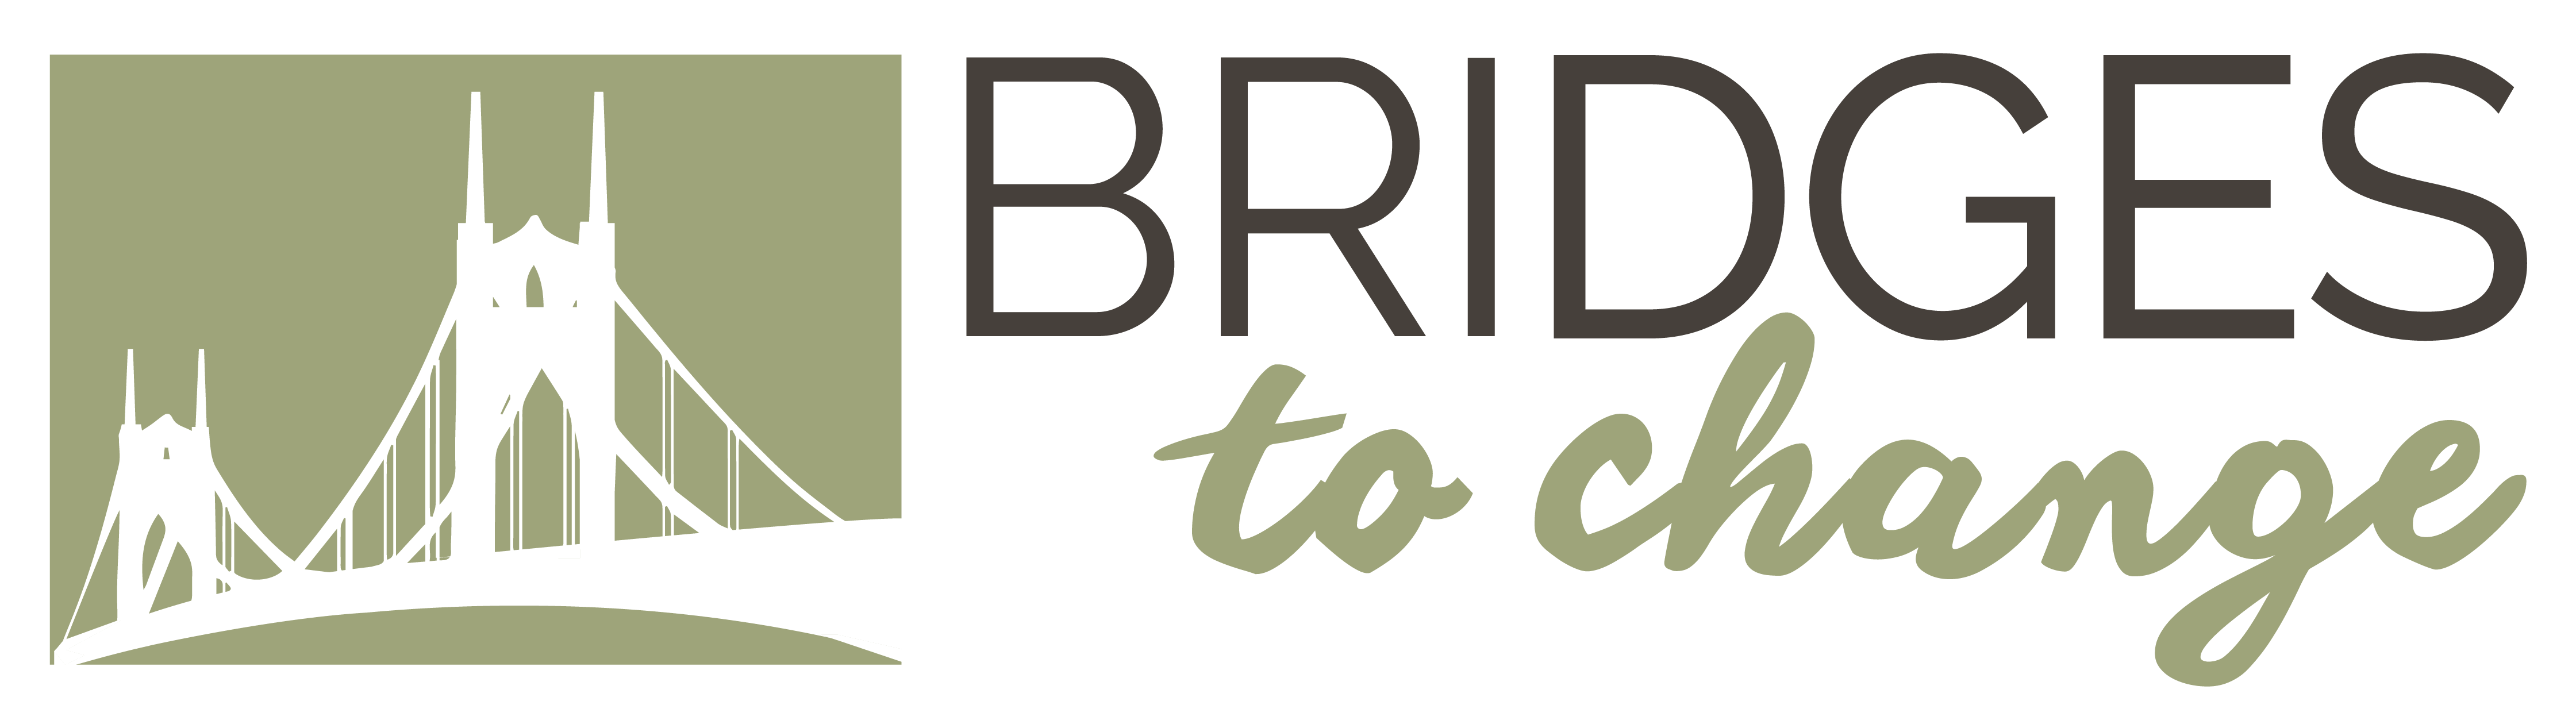 Bridges to change text with a bridge graphic